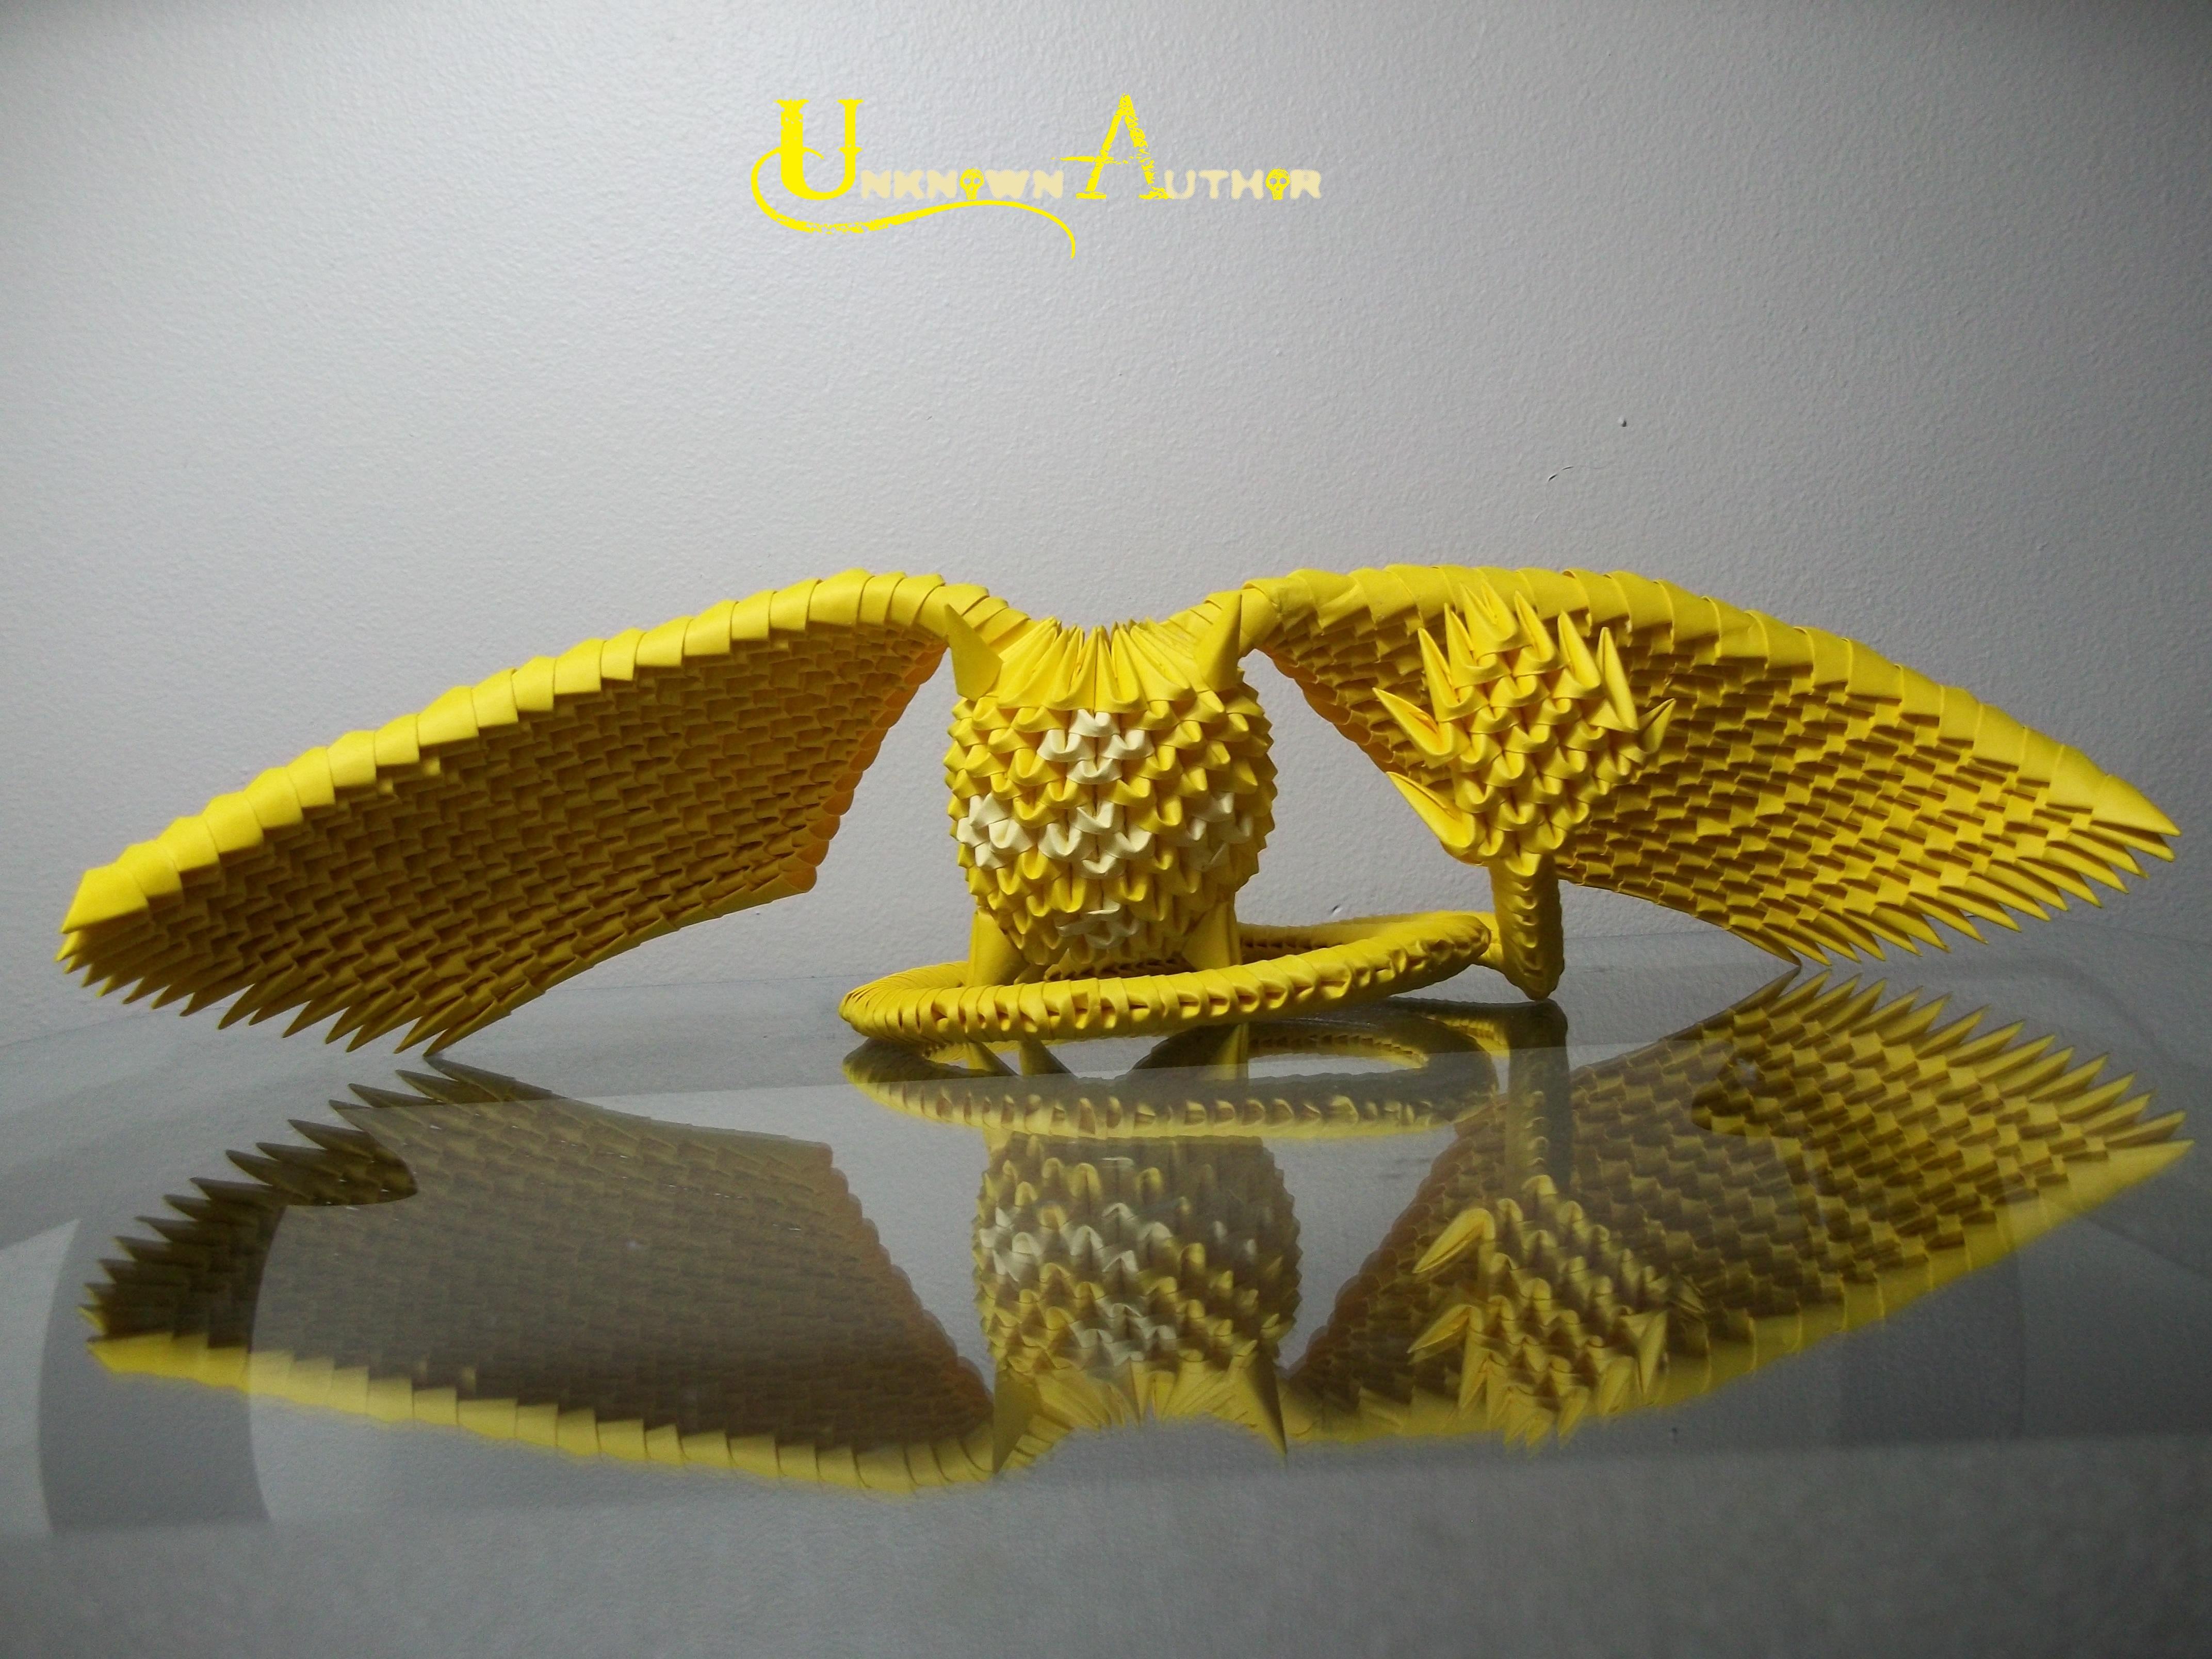 3d origami timcanpy by jobe3do on deviantart 3d origami timcanpy by jobe3do 3d origami timcanpy by jobe3do jeuxipadfo Images